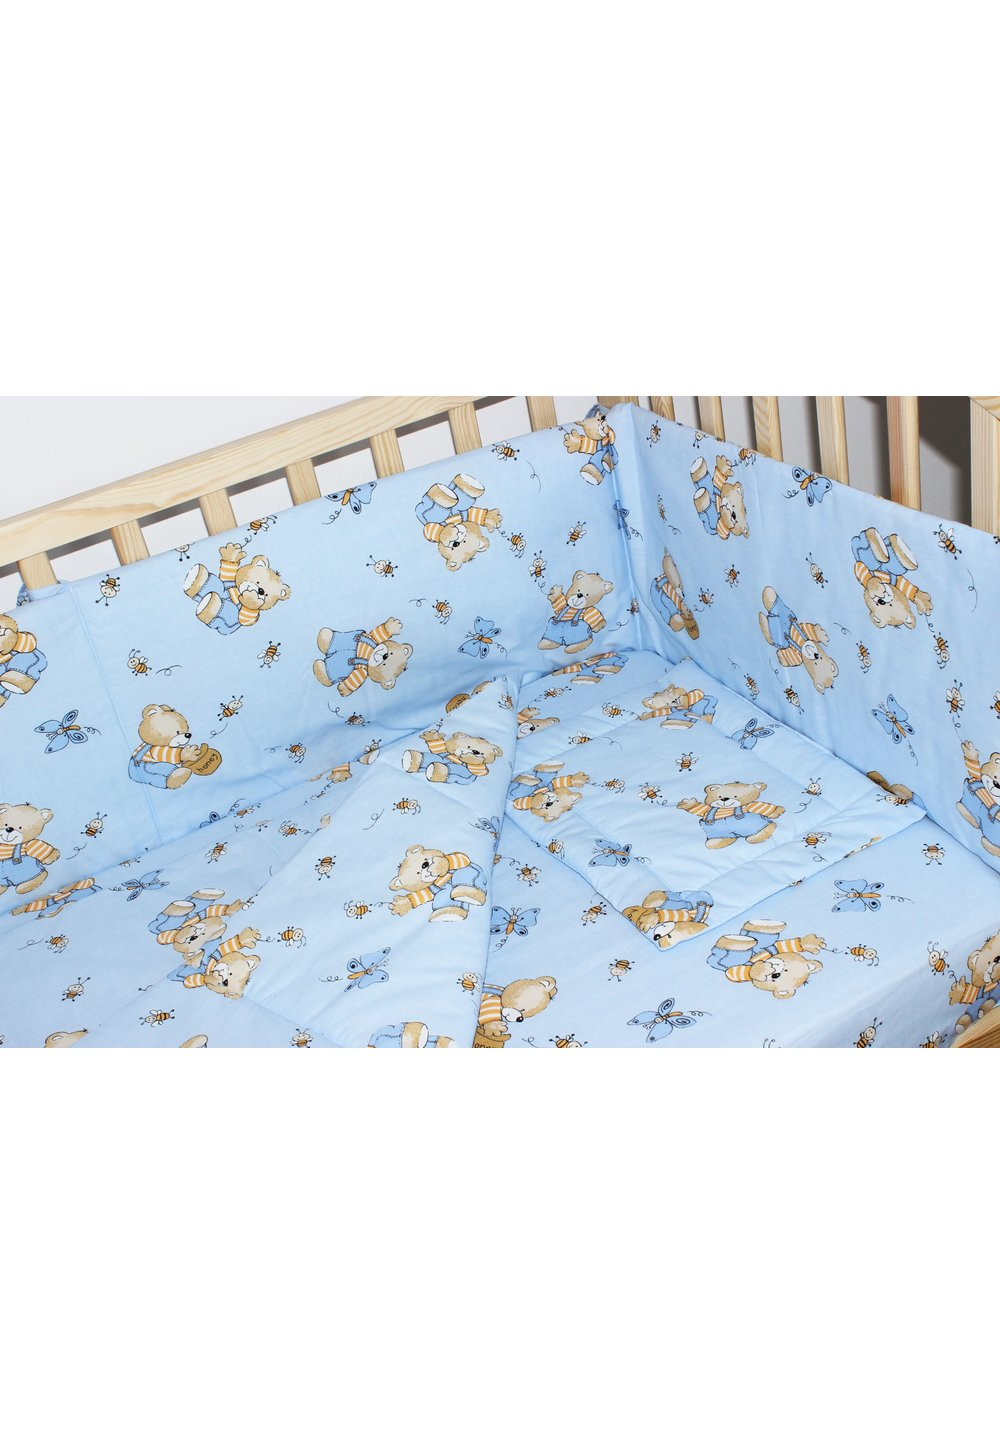 Lenjerie ursulet cu albinute albastre,4 piese imagine